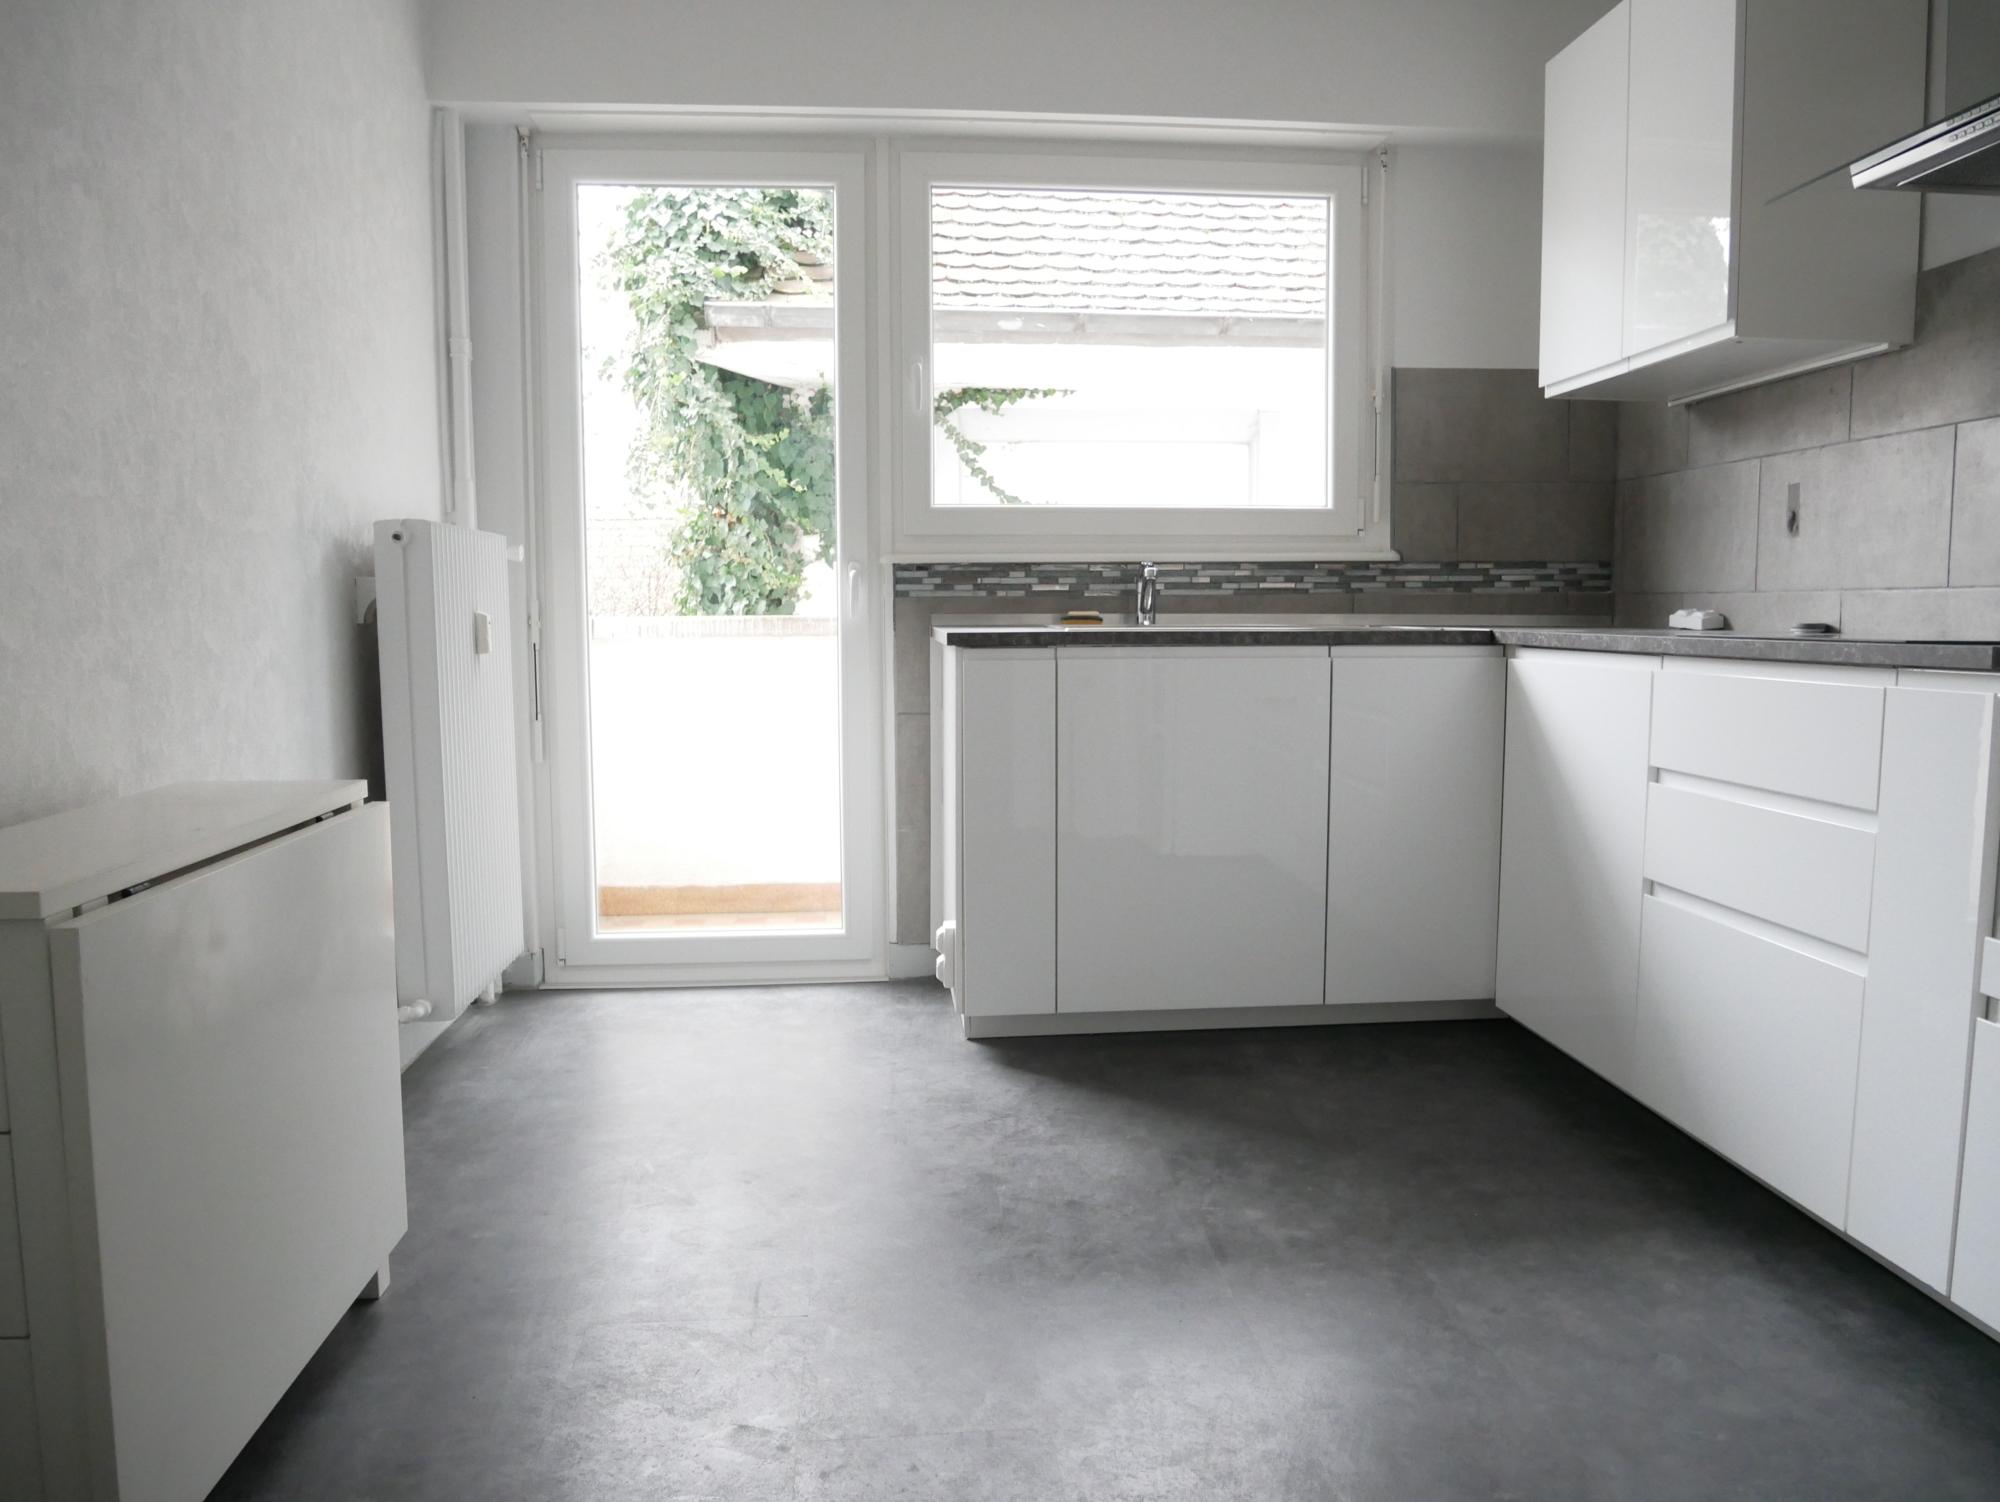 Lumineux appartement 3 pièces avec balcon - Strasbourg / Neudorf - nos ventes - Beausite Immobilier 3